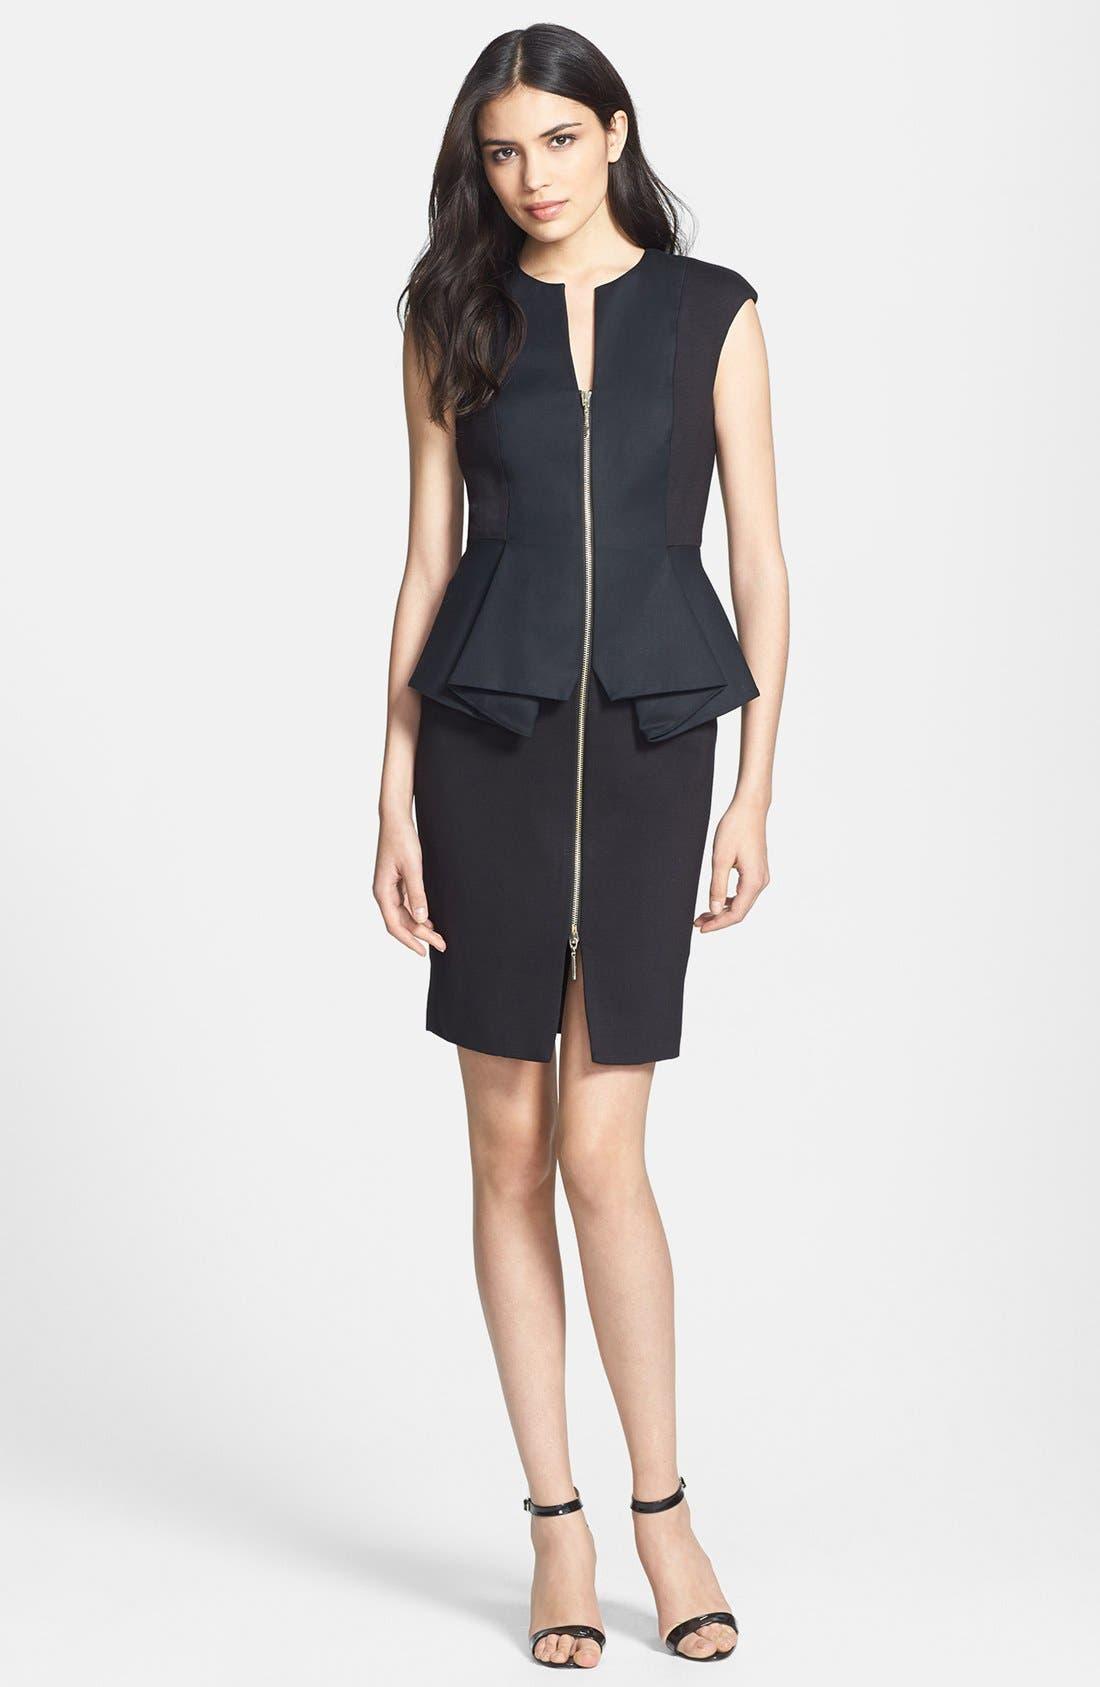 Main Image - Ted Baker London 'Jamthun' Structured Peplum Cotton Blend Sheath Dress